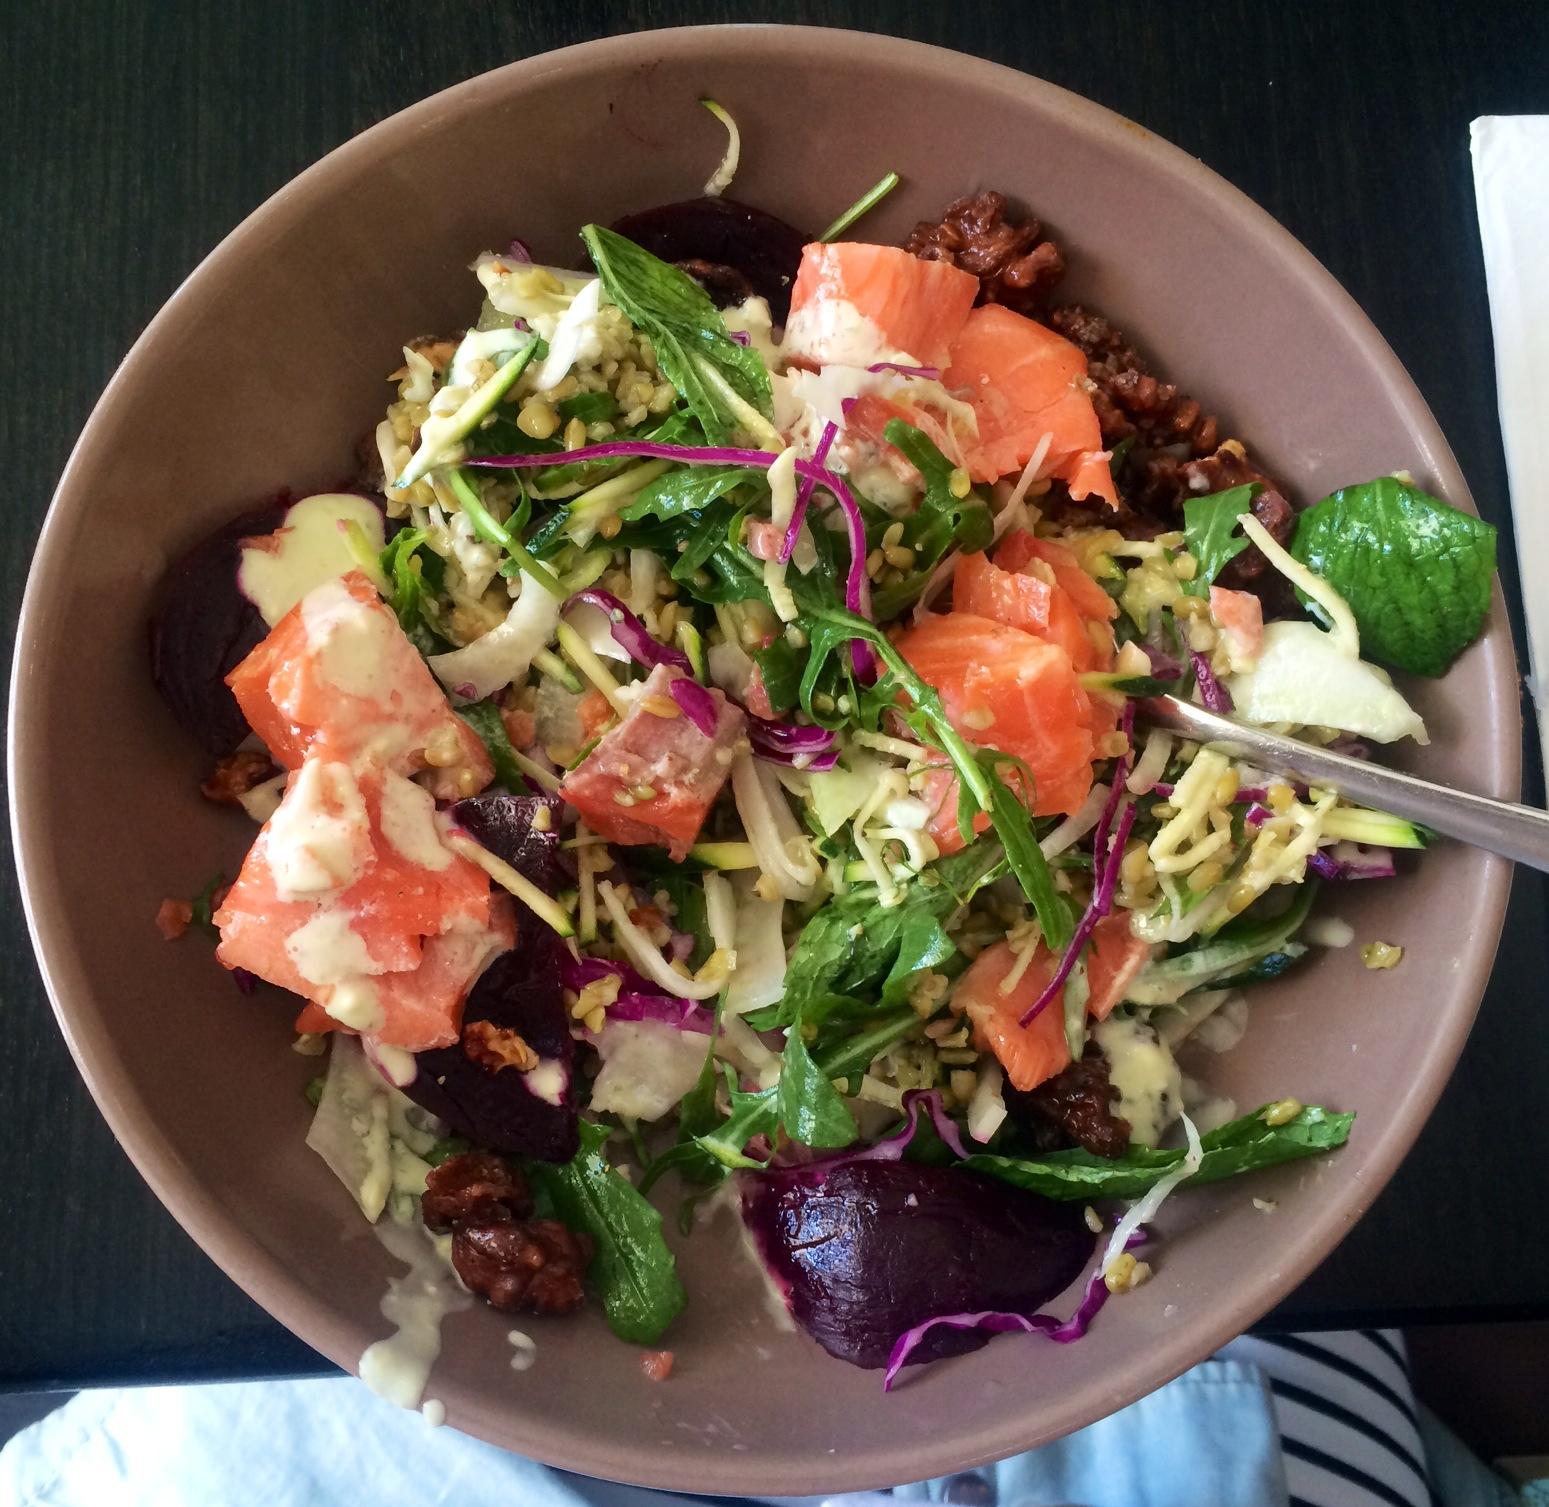 Best salad in bondi beach